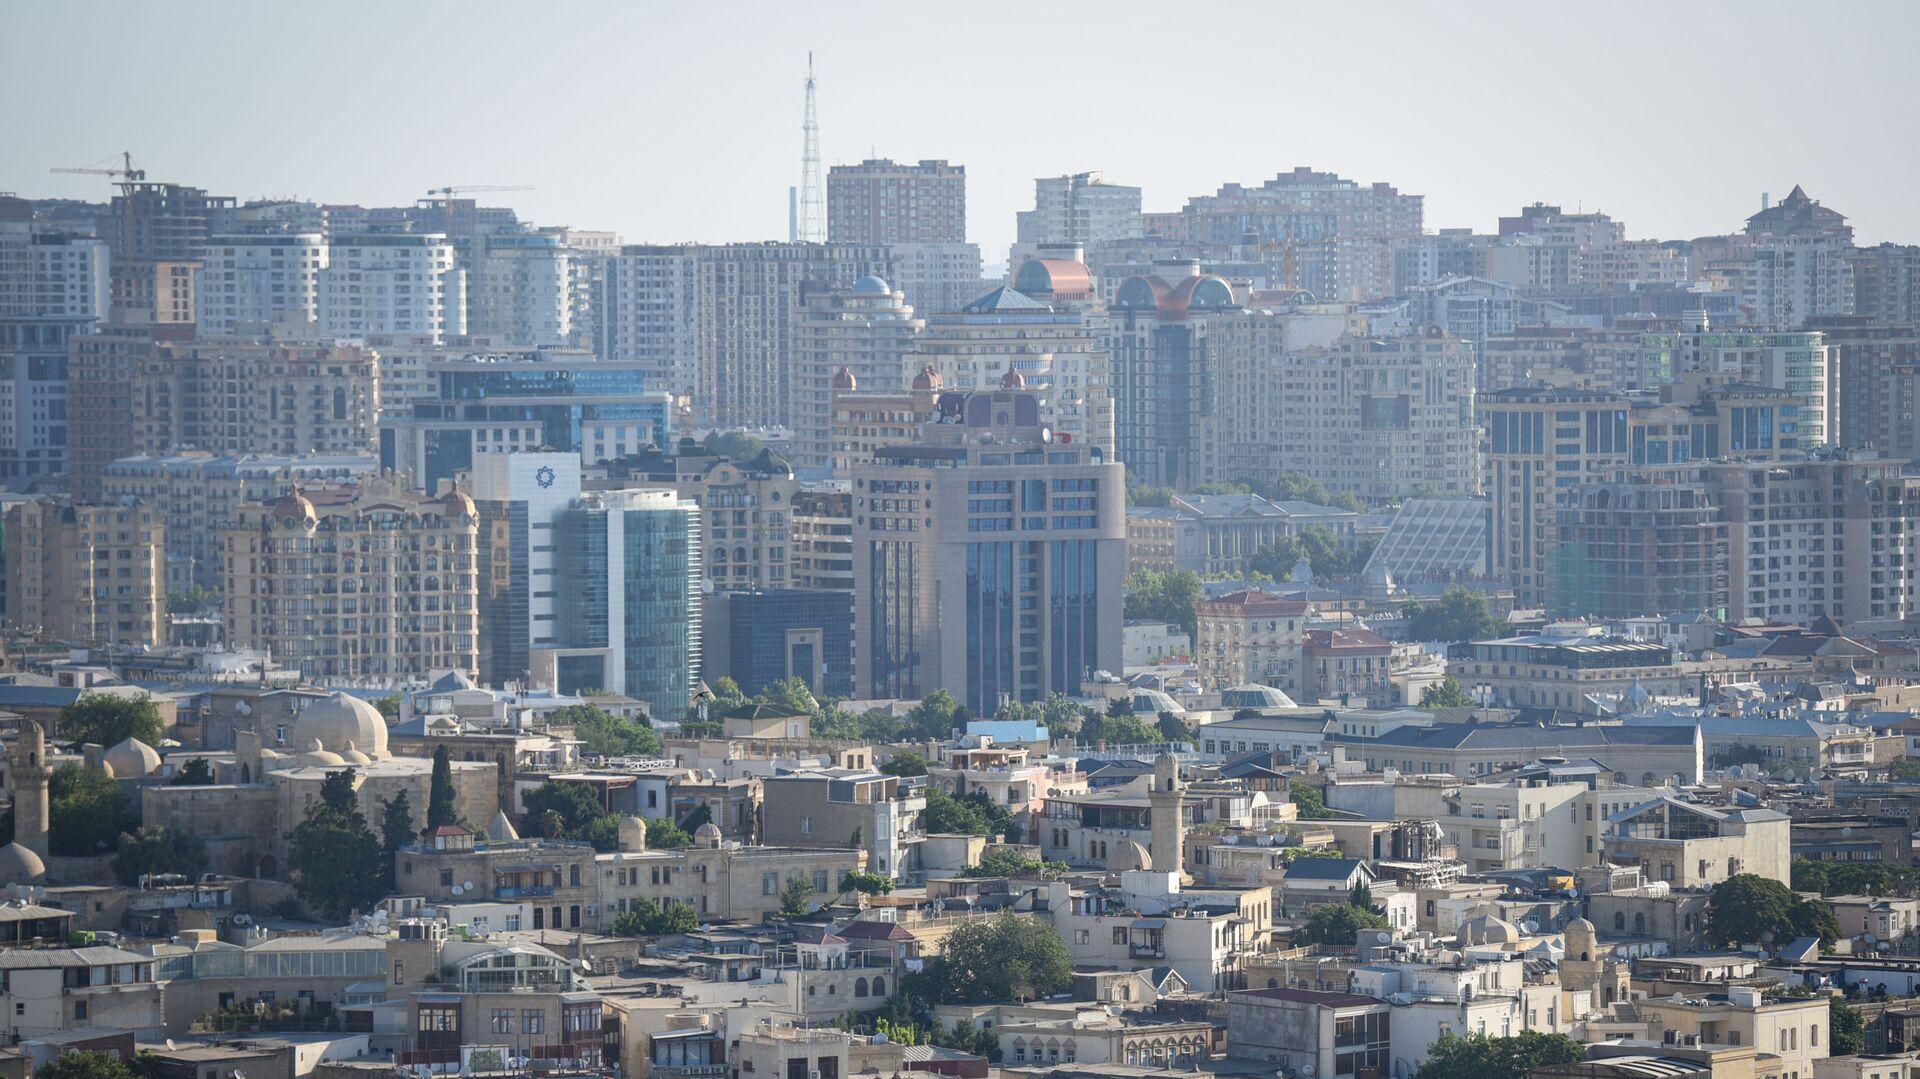 Вид на Баку, фото из архива - Sputnik Азербайджан, 1920, 10.08.2021